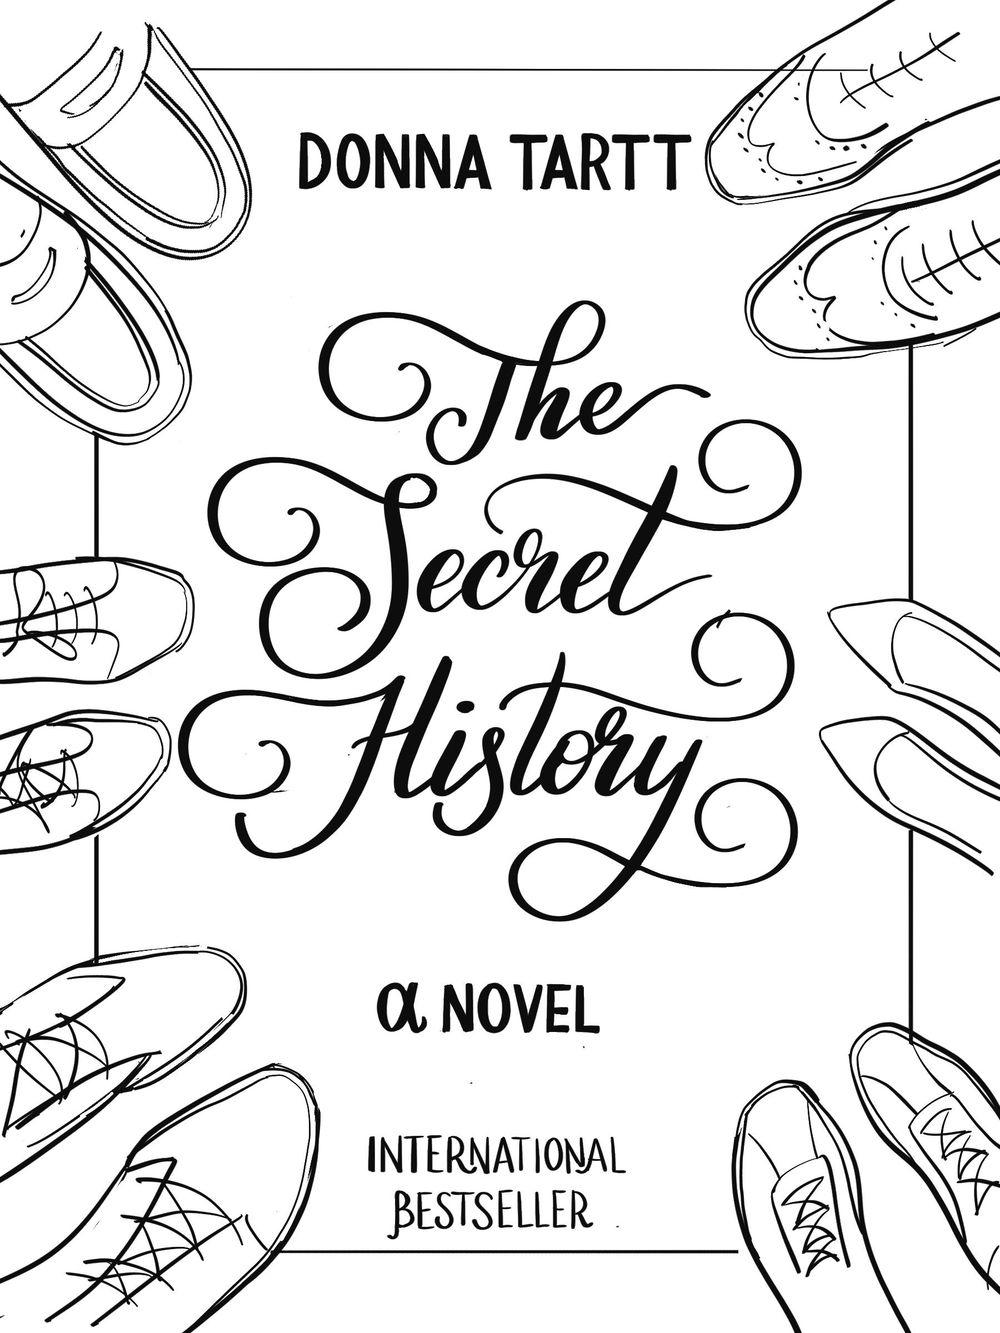 Donna Tartt - The secret history - image 6 - student project